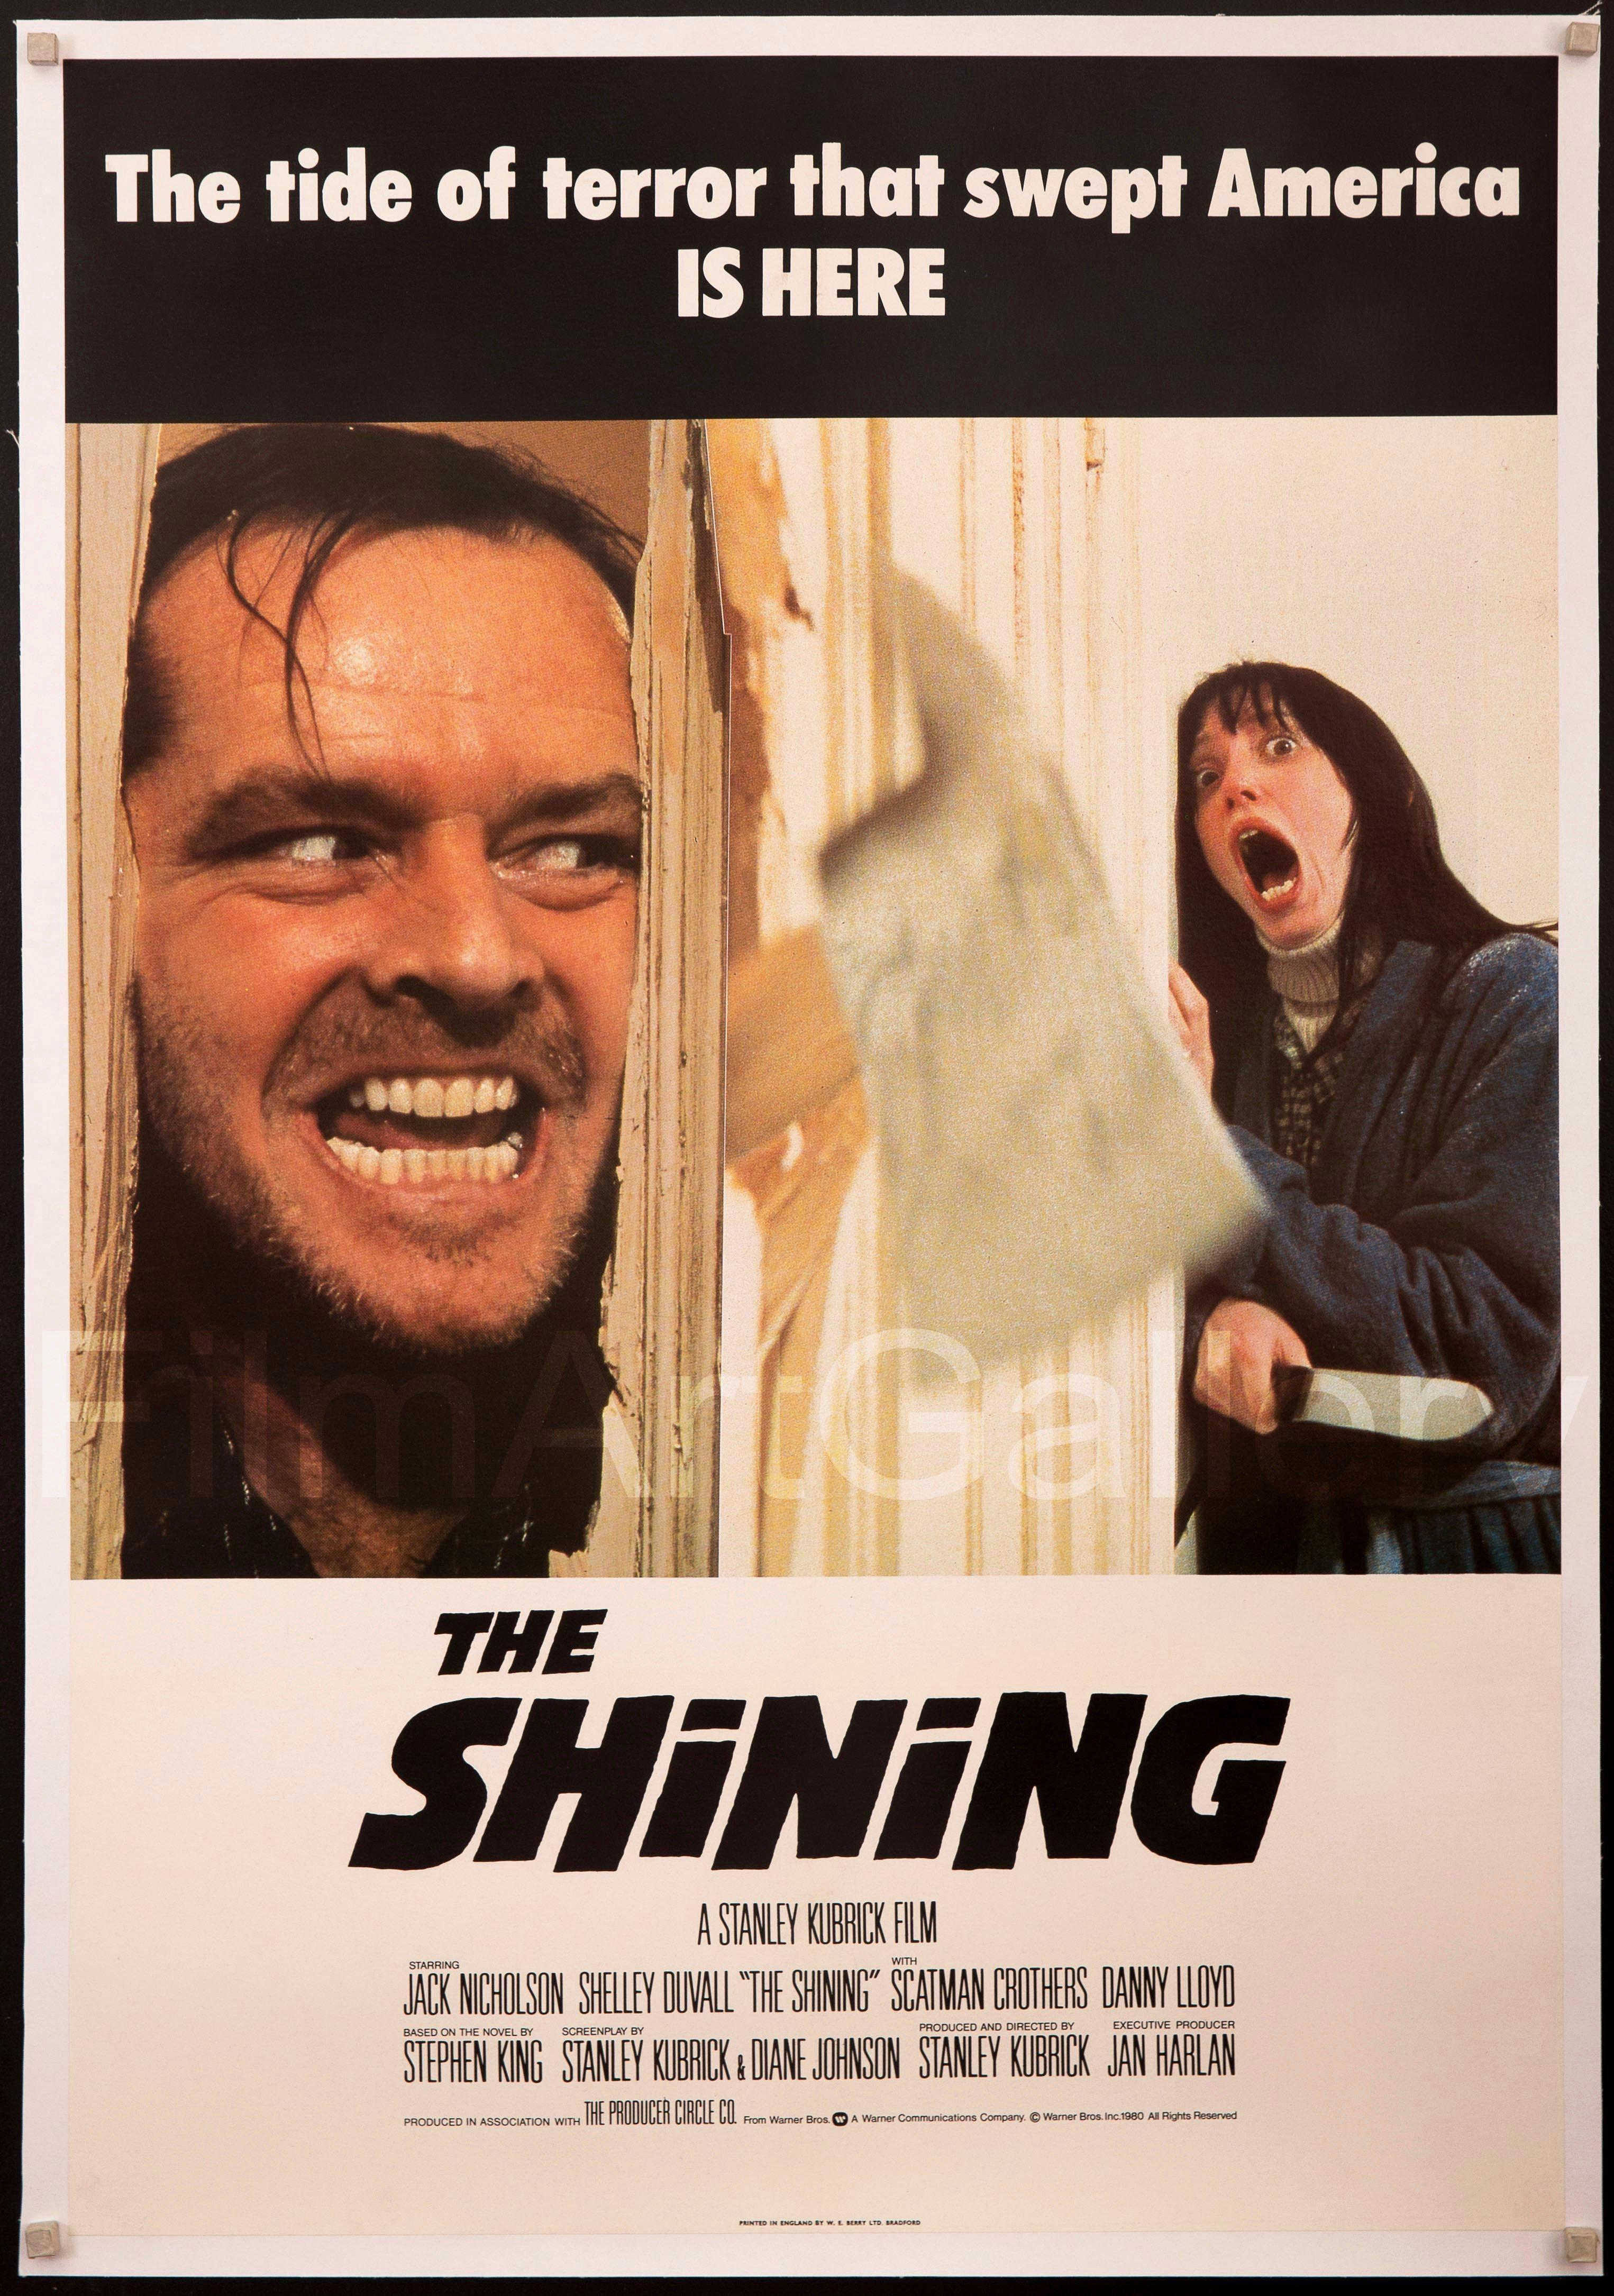 phim kinh di halloween - The Shining - elle man